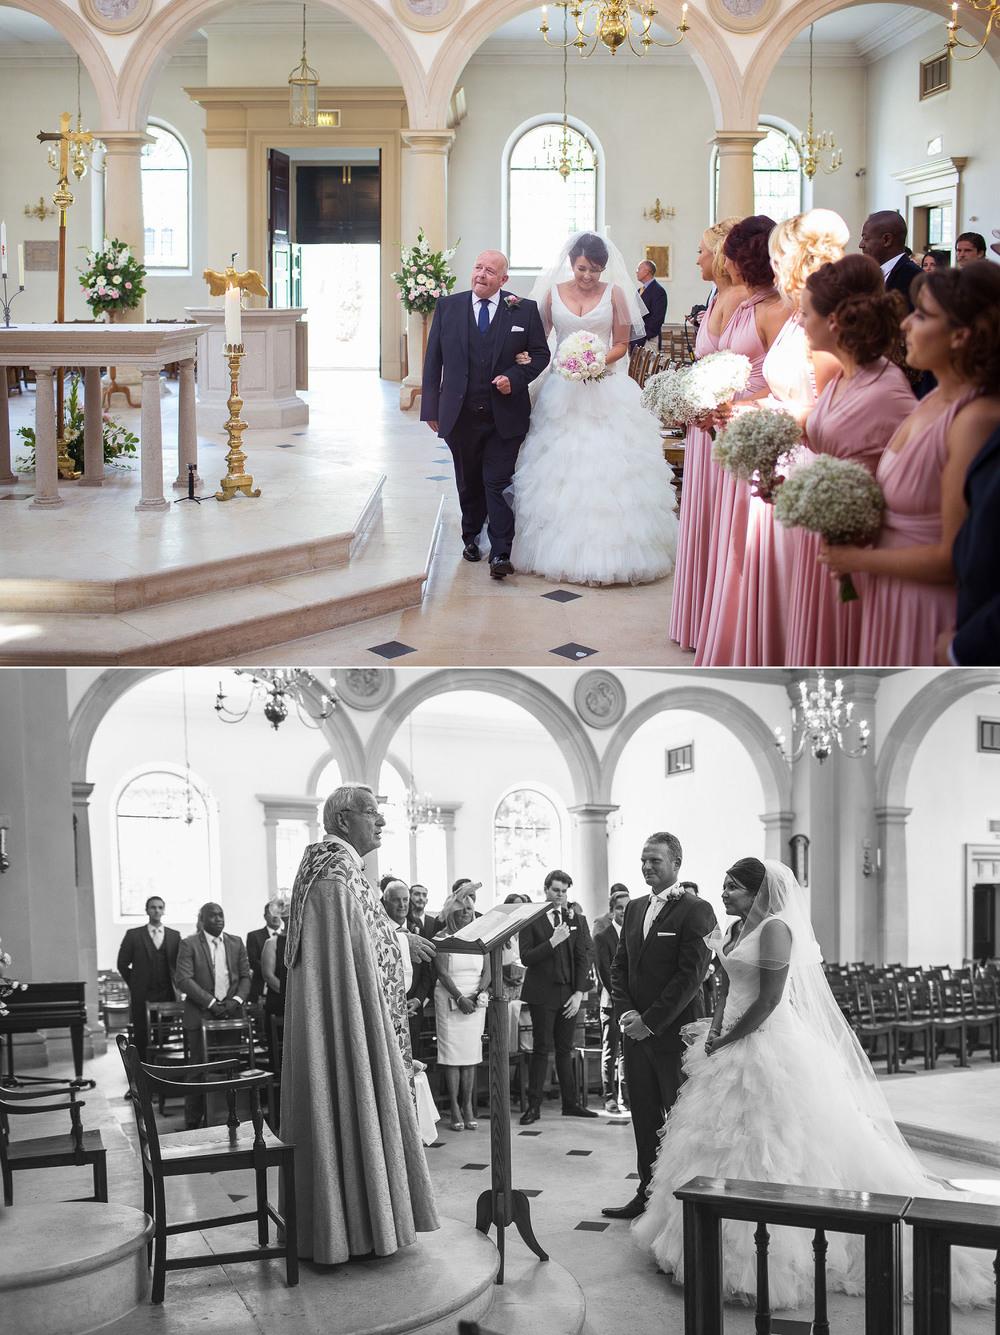 Old Brook Barn Essex Wedding by Anesta Broad_0126.jpg